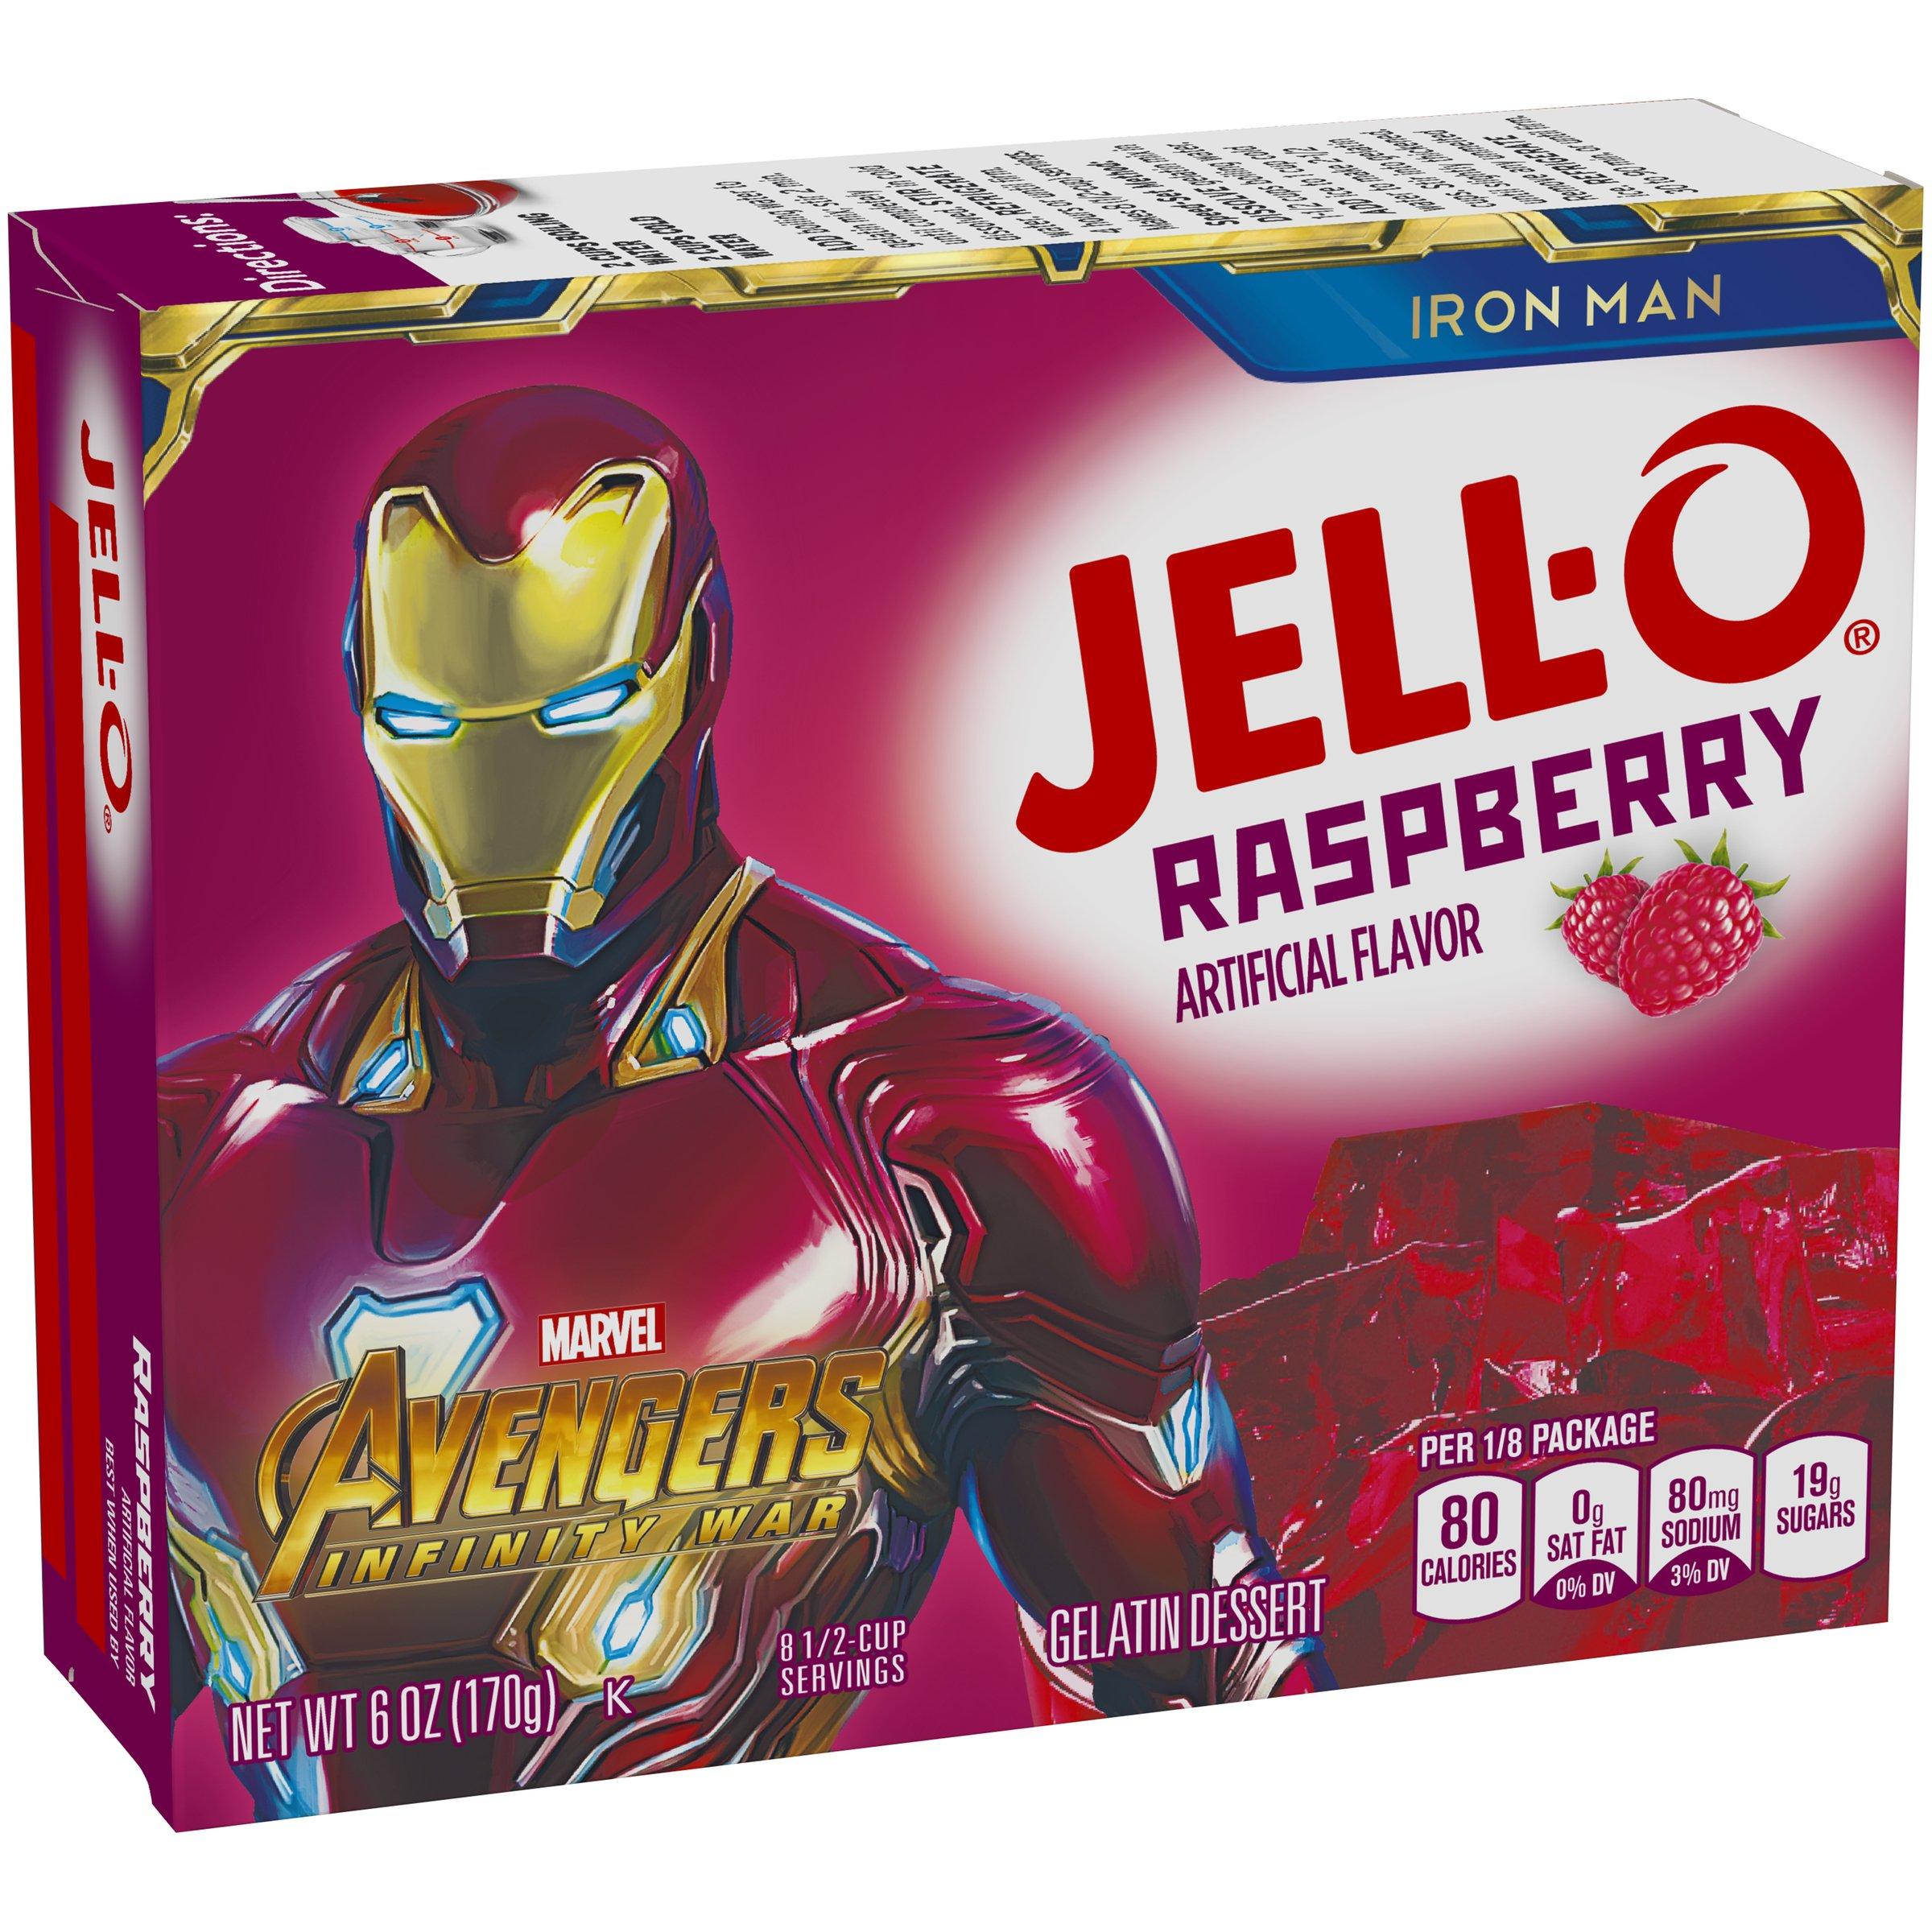 Jell-O Raspberry Gelatin Dessert Mix, 6 oz Box by Jell-O (Image #4)